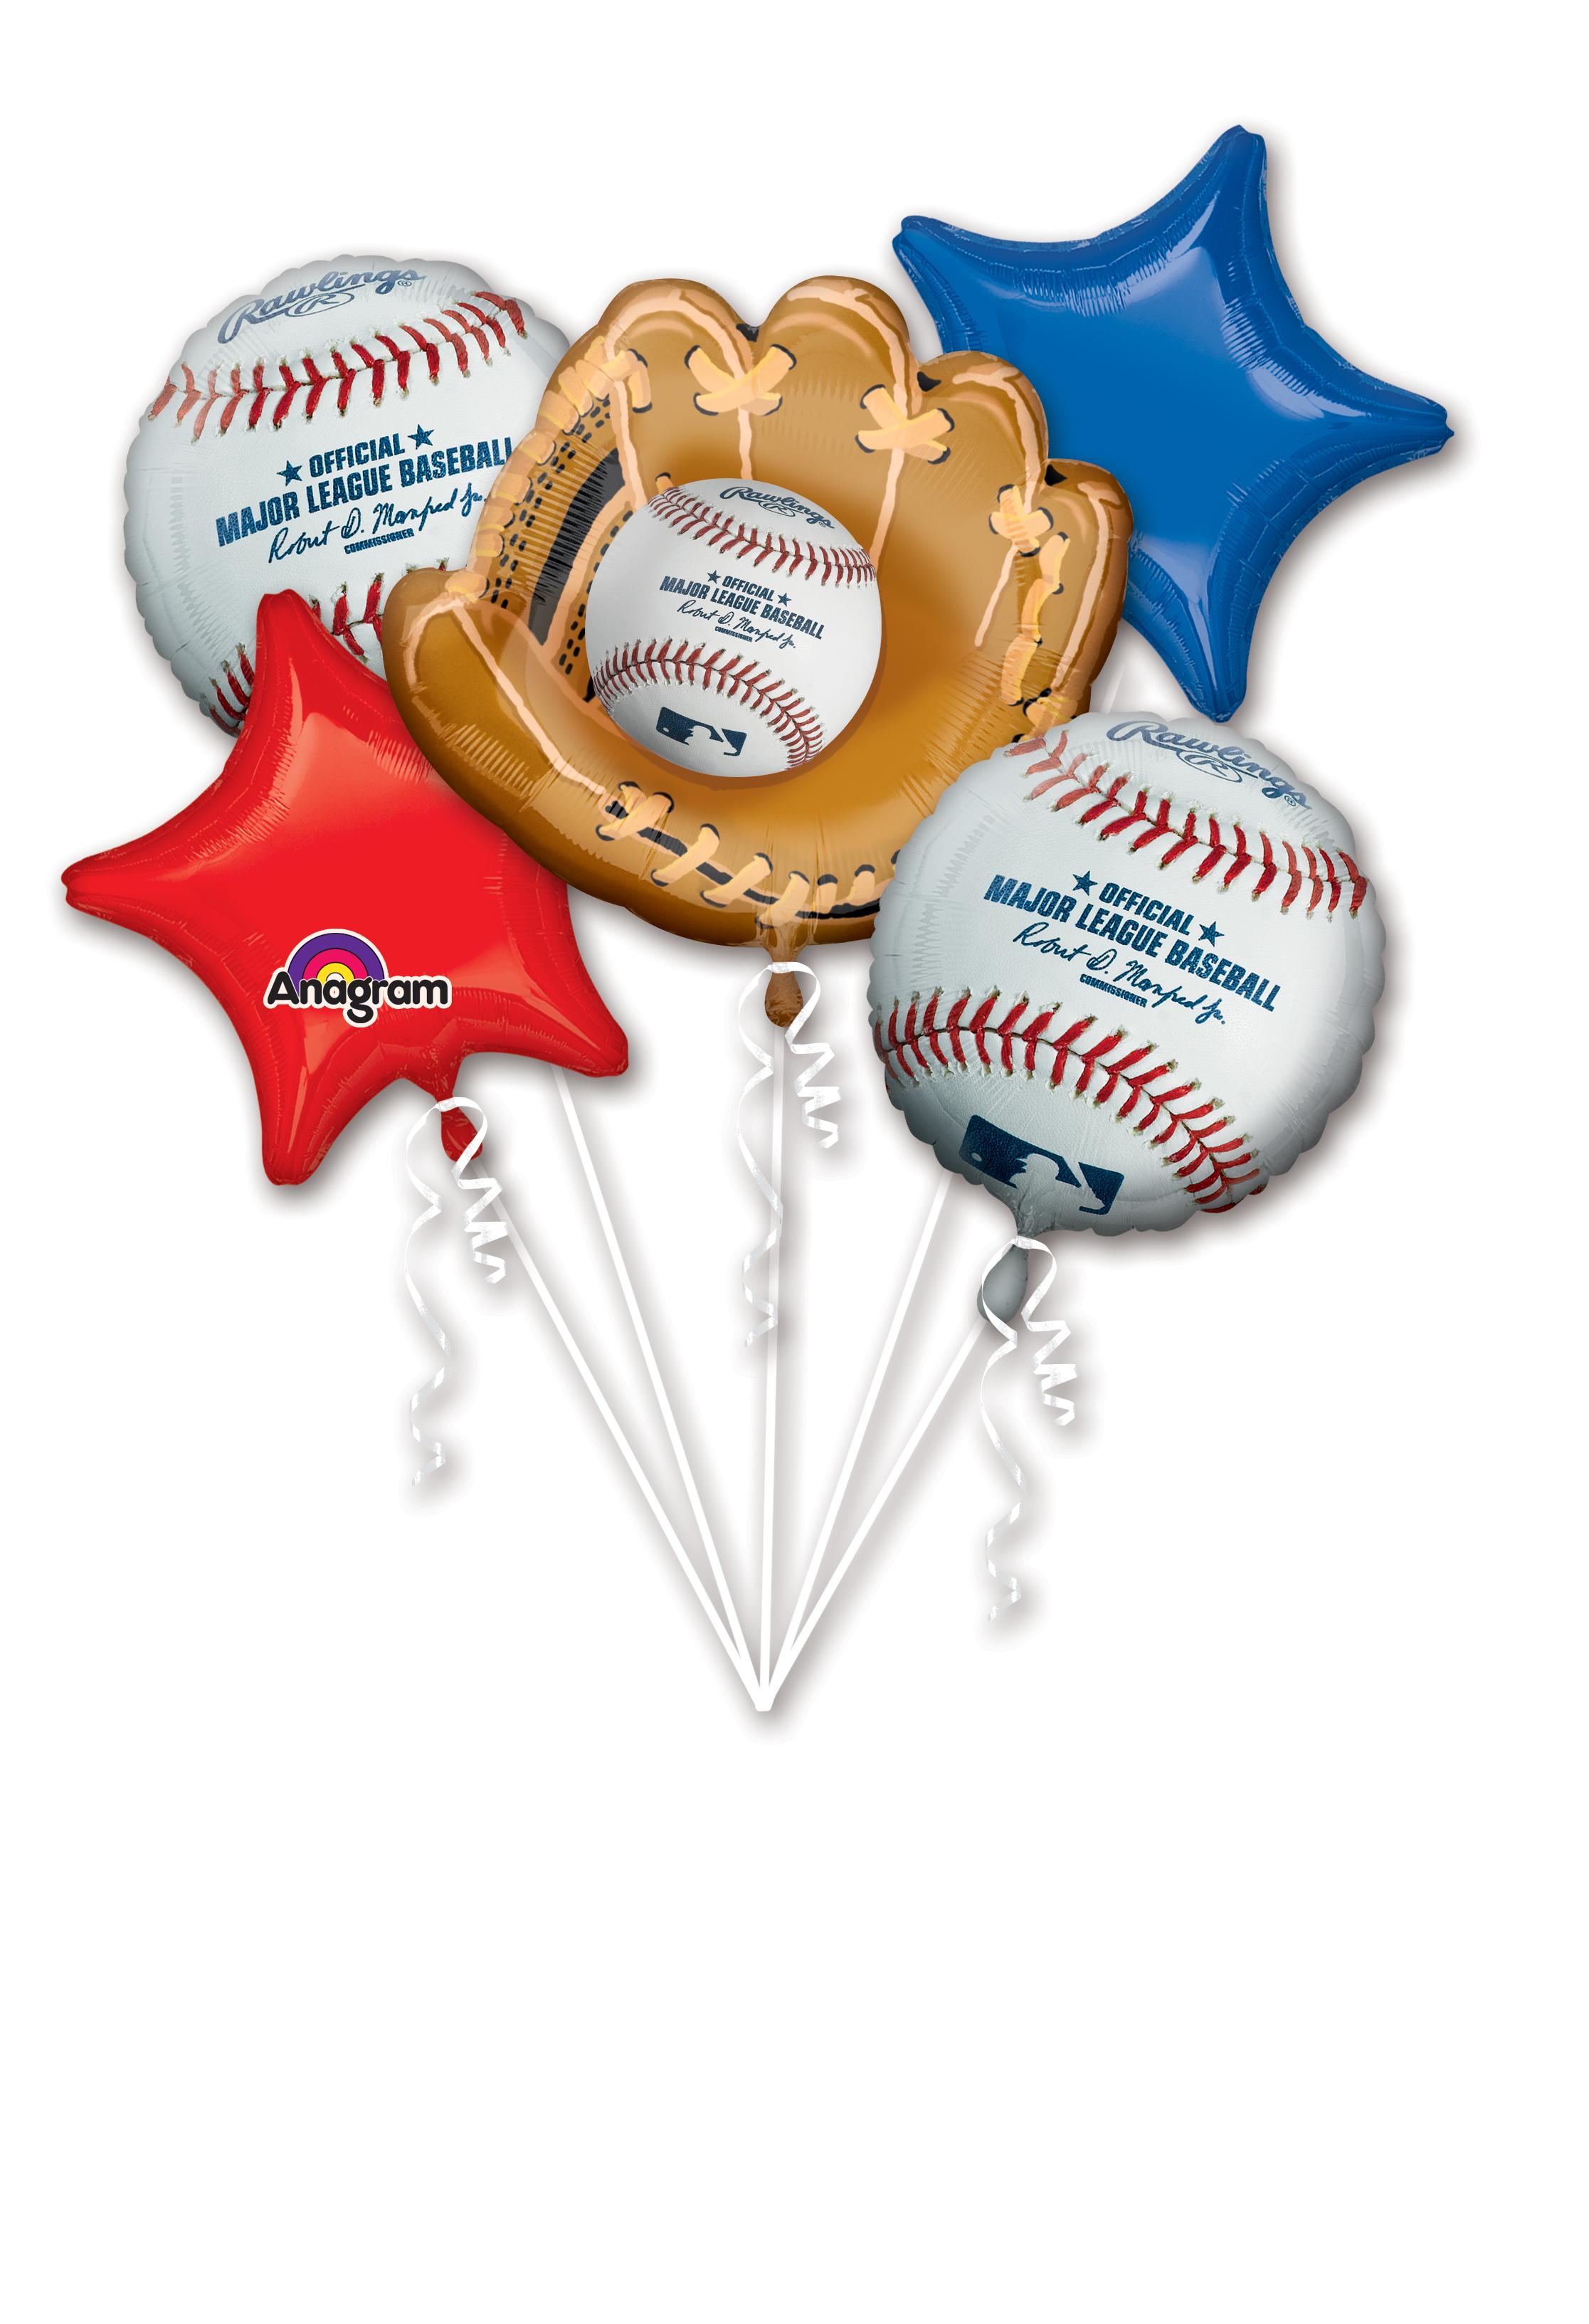 Bouquet Major League Baseball Balloon Packaged